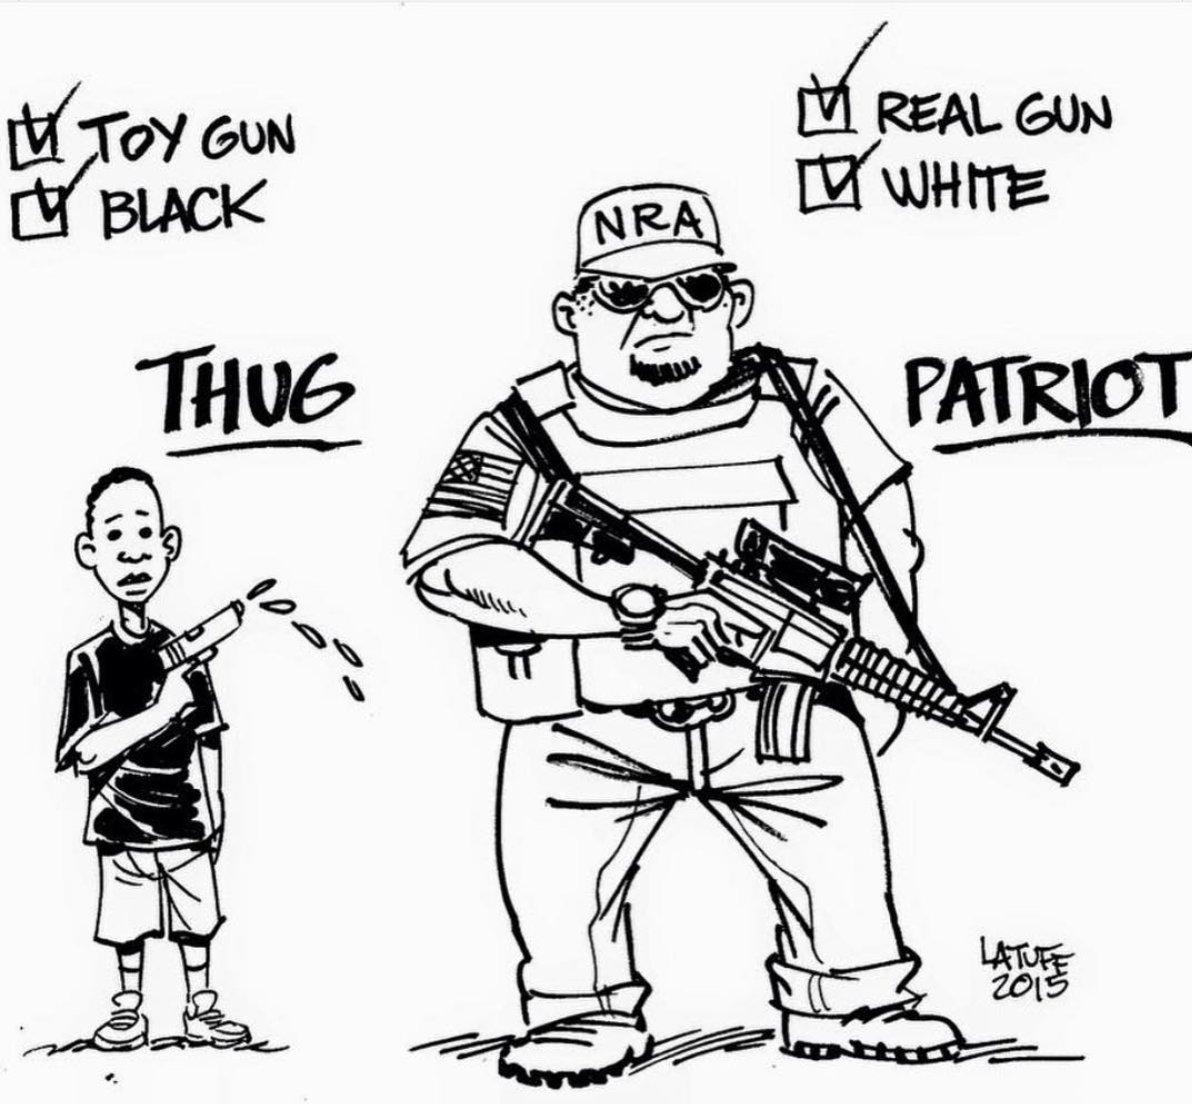 rickey smiley on twitter thug vs patriot Fireworks Tommy Gun 9 07 am 7 jan 2019